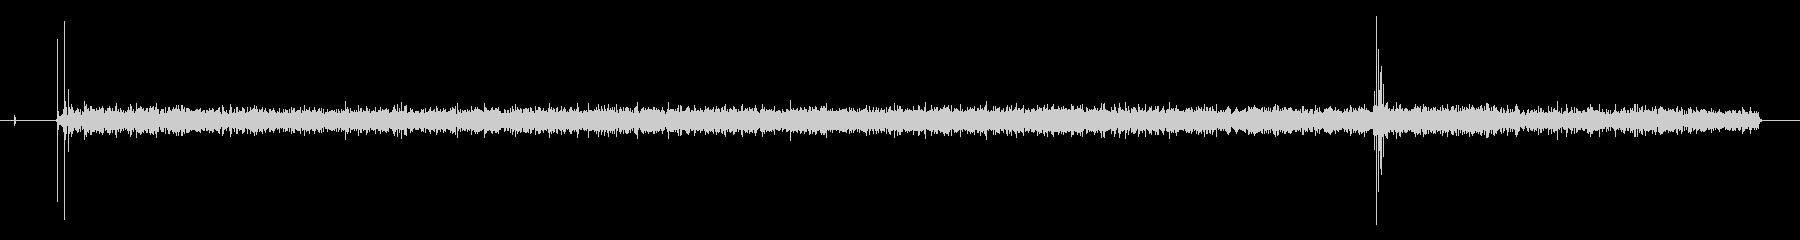 35 MM SLR:タイマーウィン...の未再生の波形